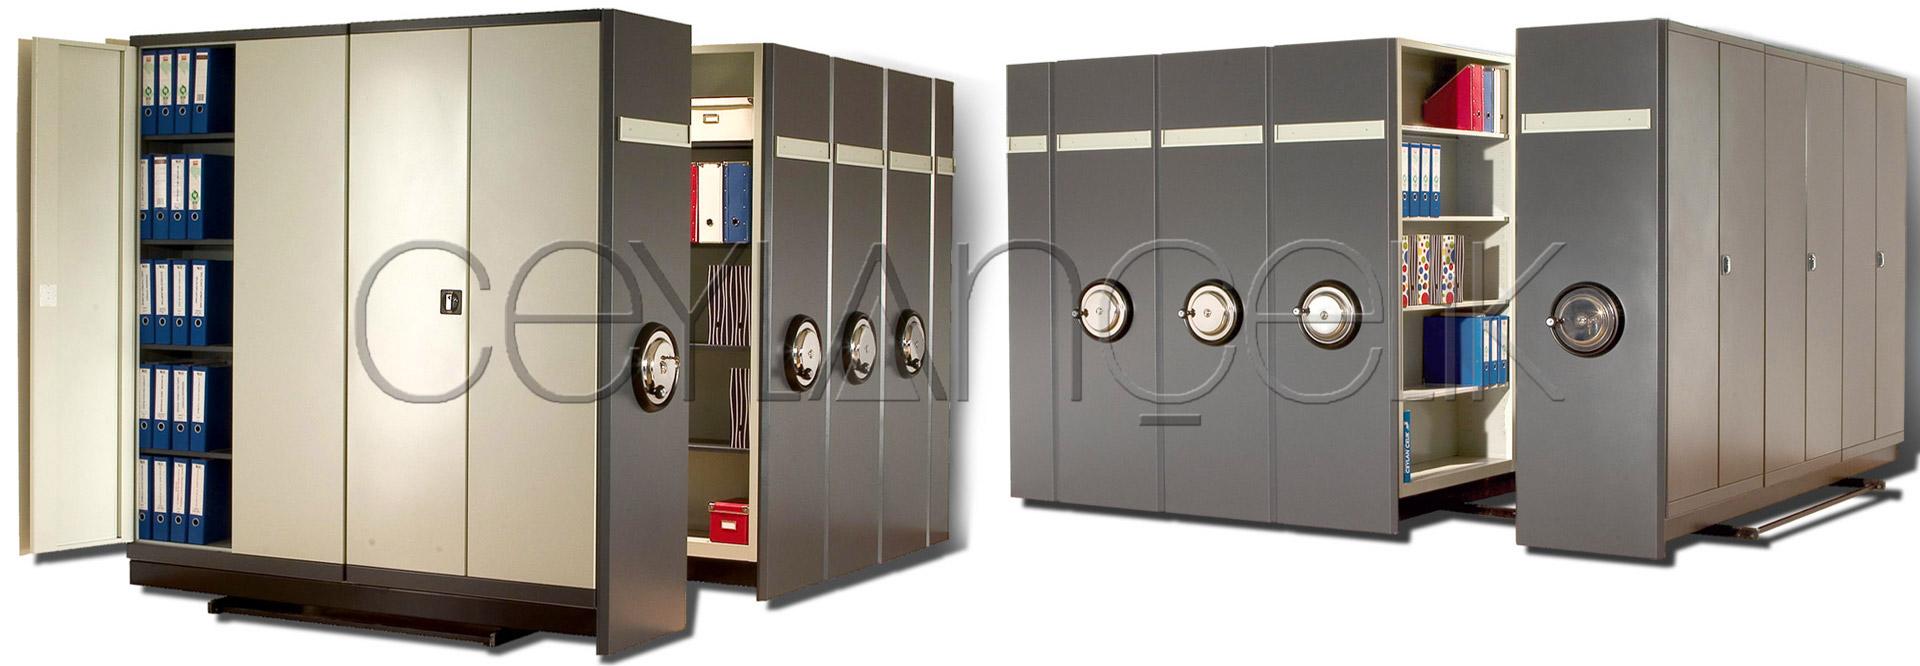 Compact Arşiv Sistemleri